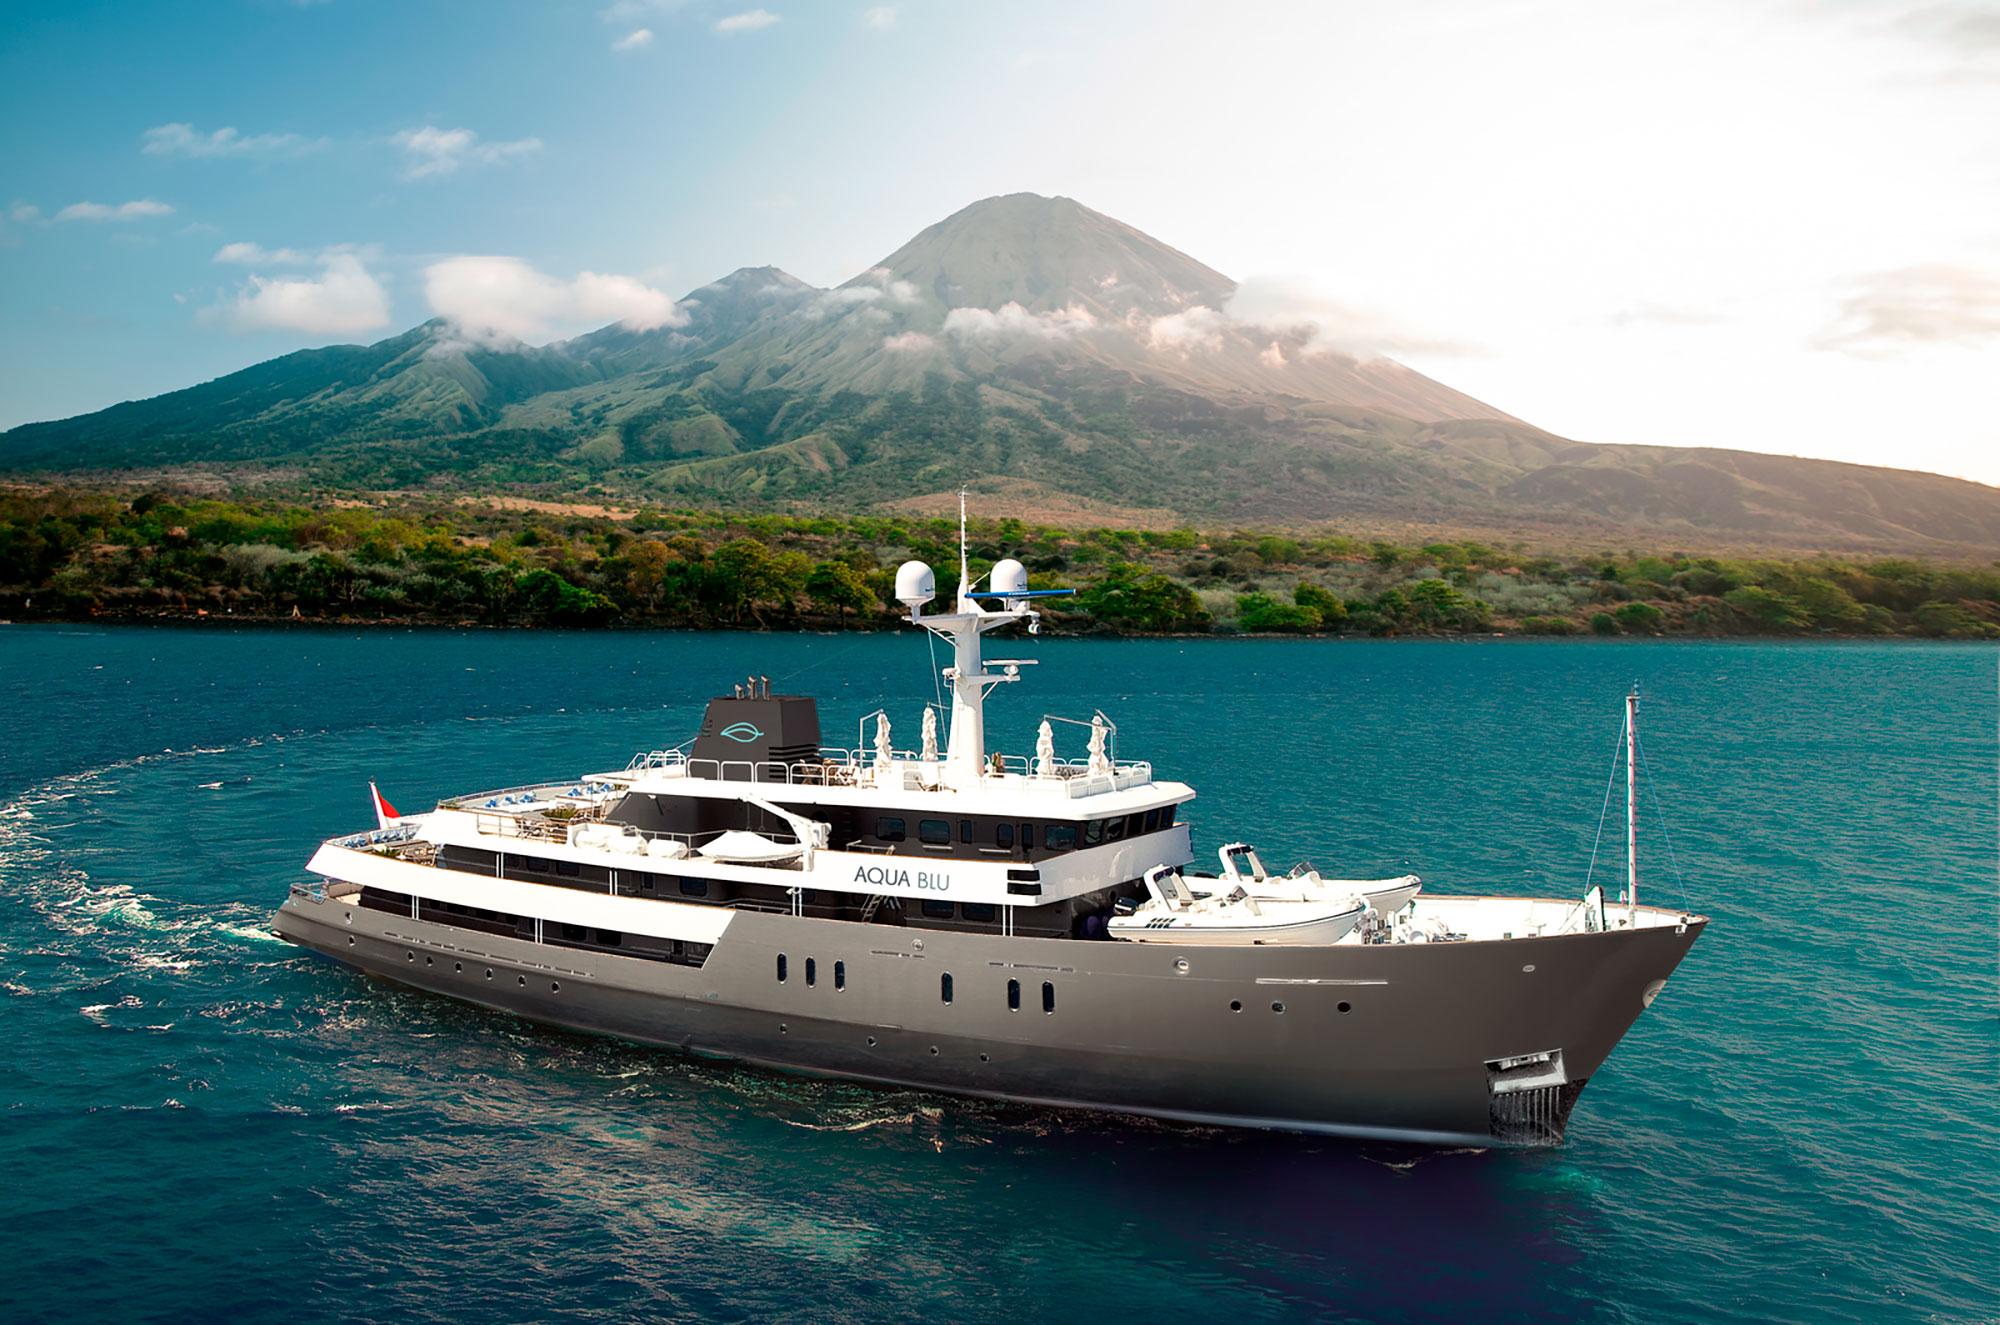 Crucero AQUA BLU de 12 noches - Viaje Inaugural - Bali to Flores - Indonesia- imagen #9